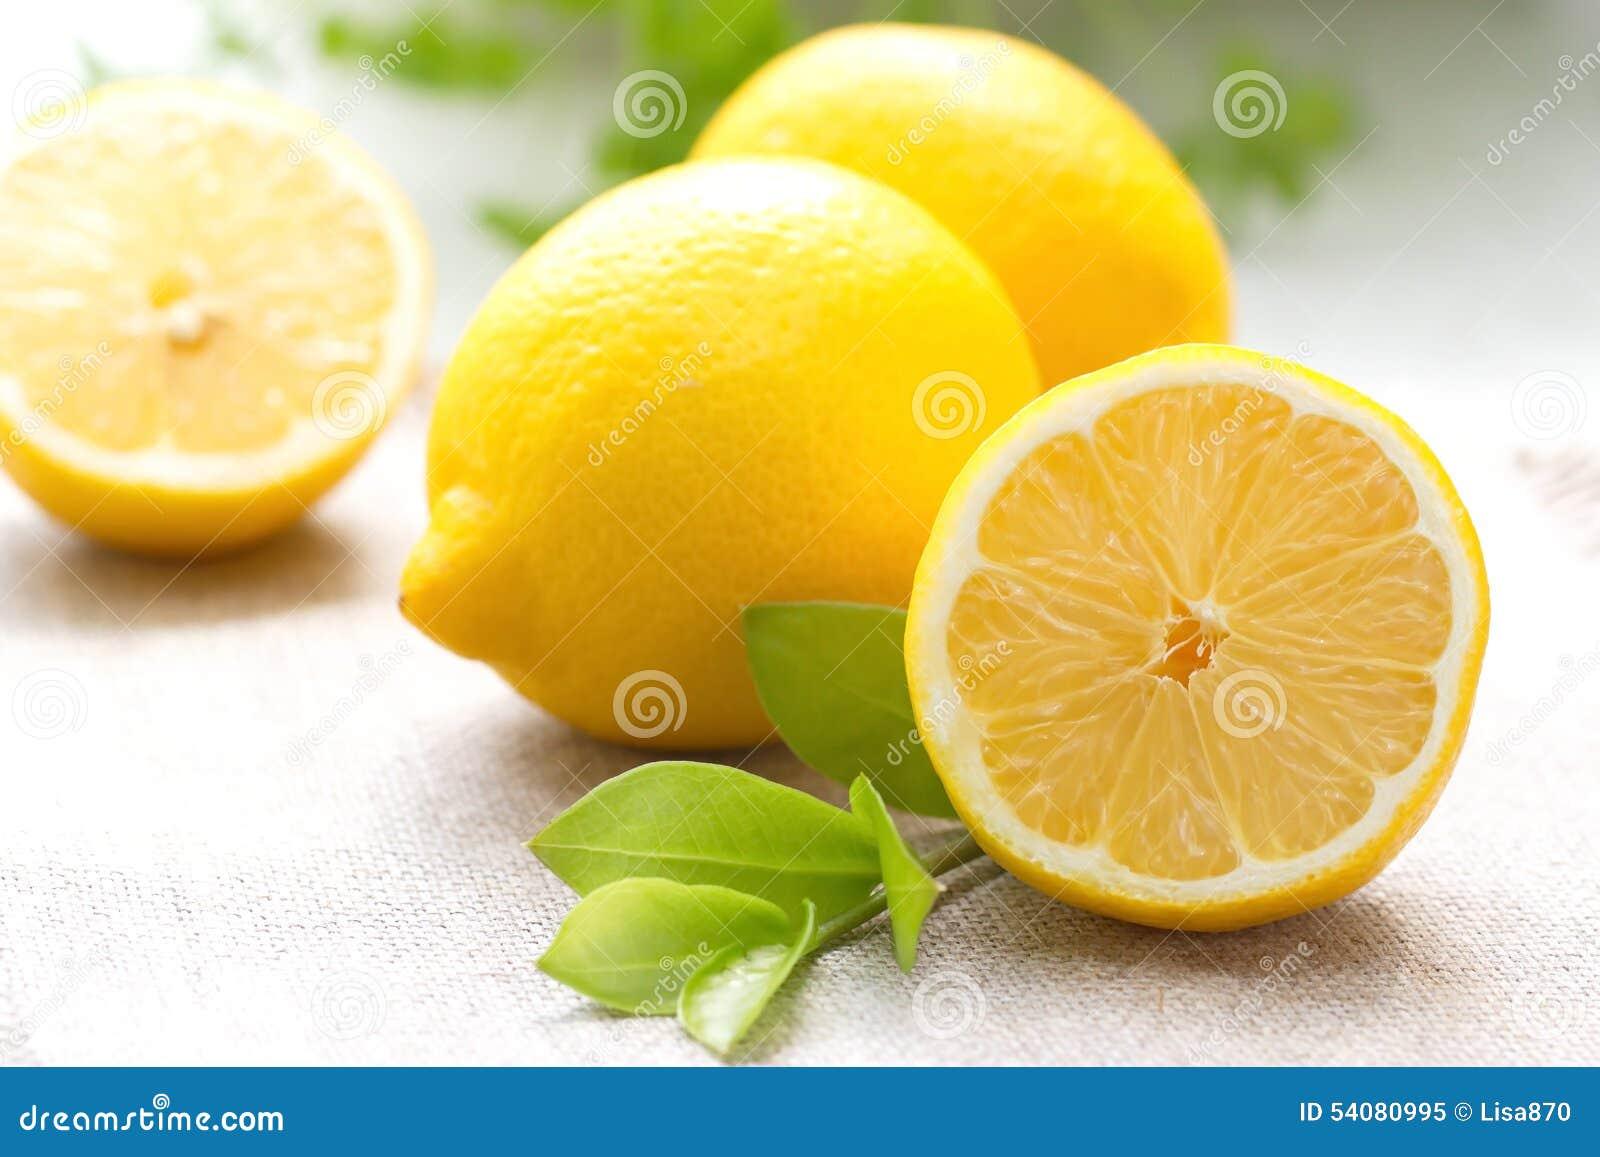 Fresh Lemon Stock Image. Image Of Food, Crust, Vitamin